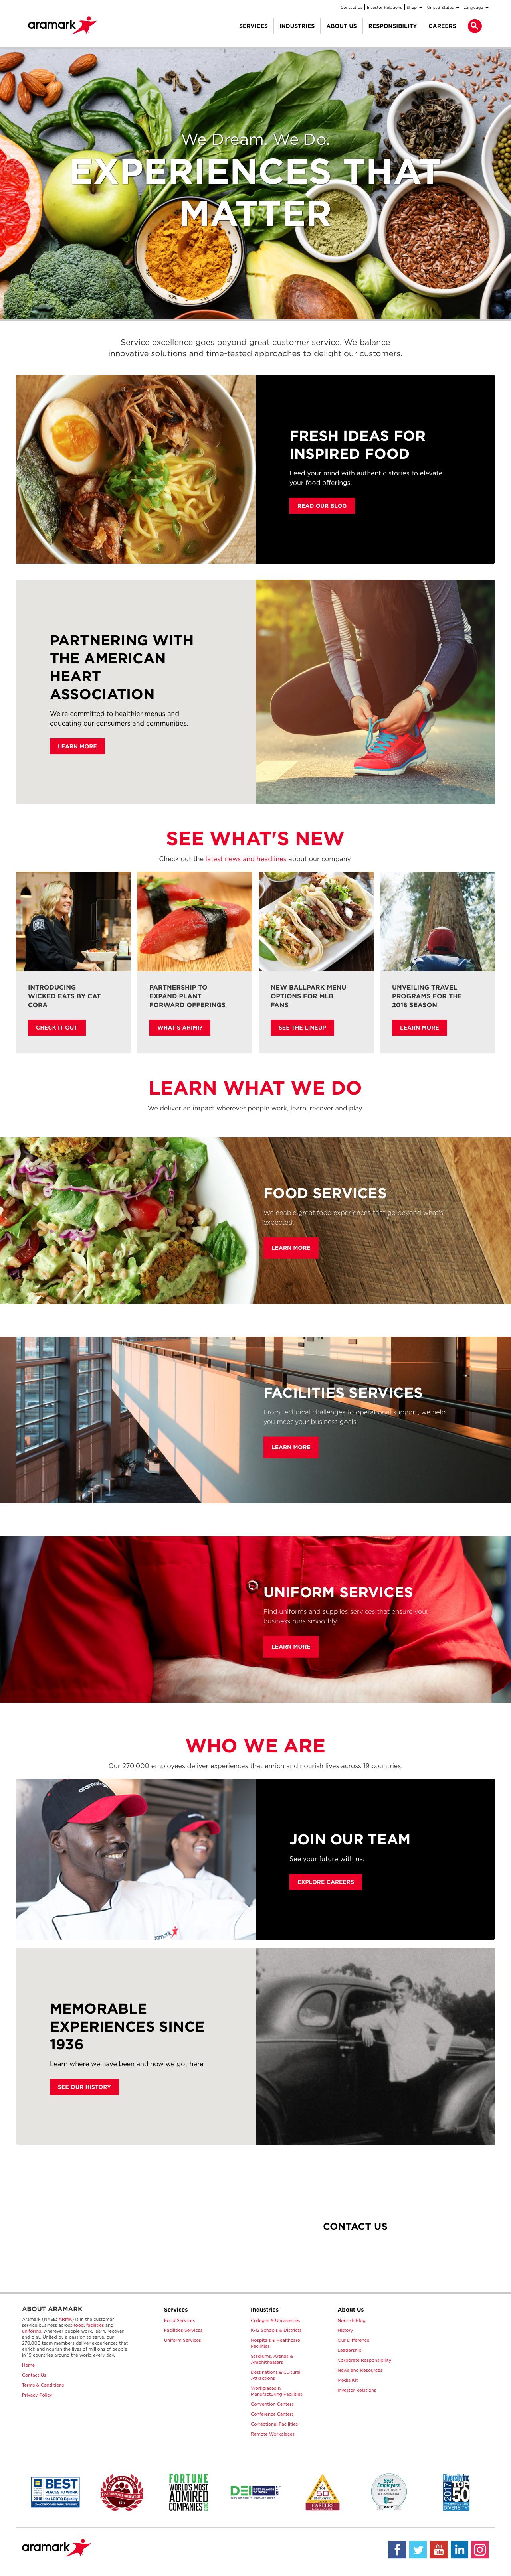 Screenshot of aramark.com - Aramark | Food, Facilities, and Uniform Services - captured June 18, 2018